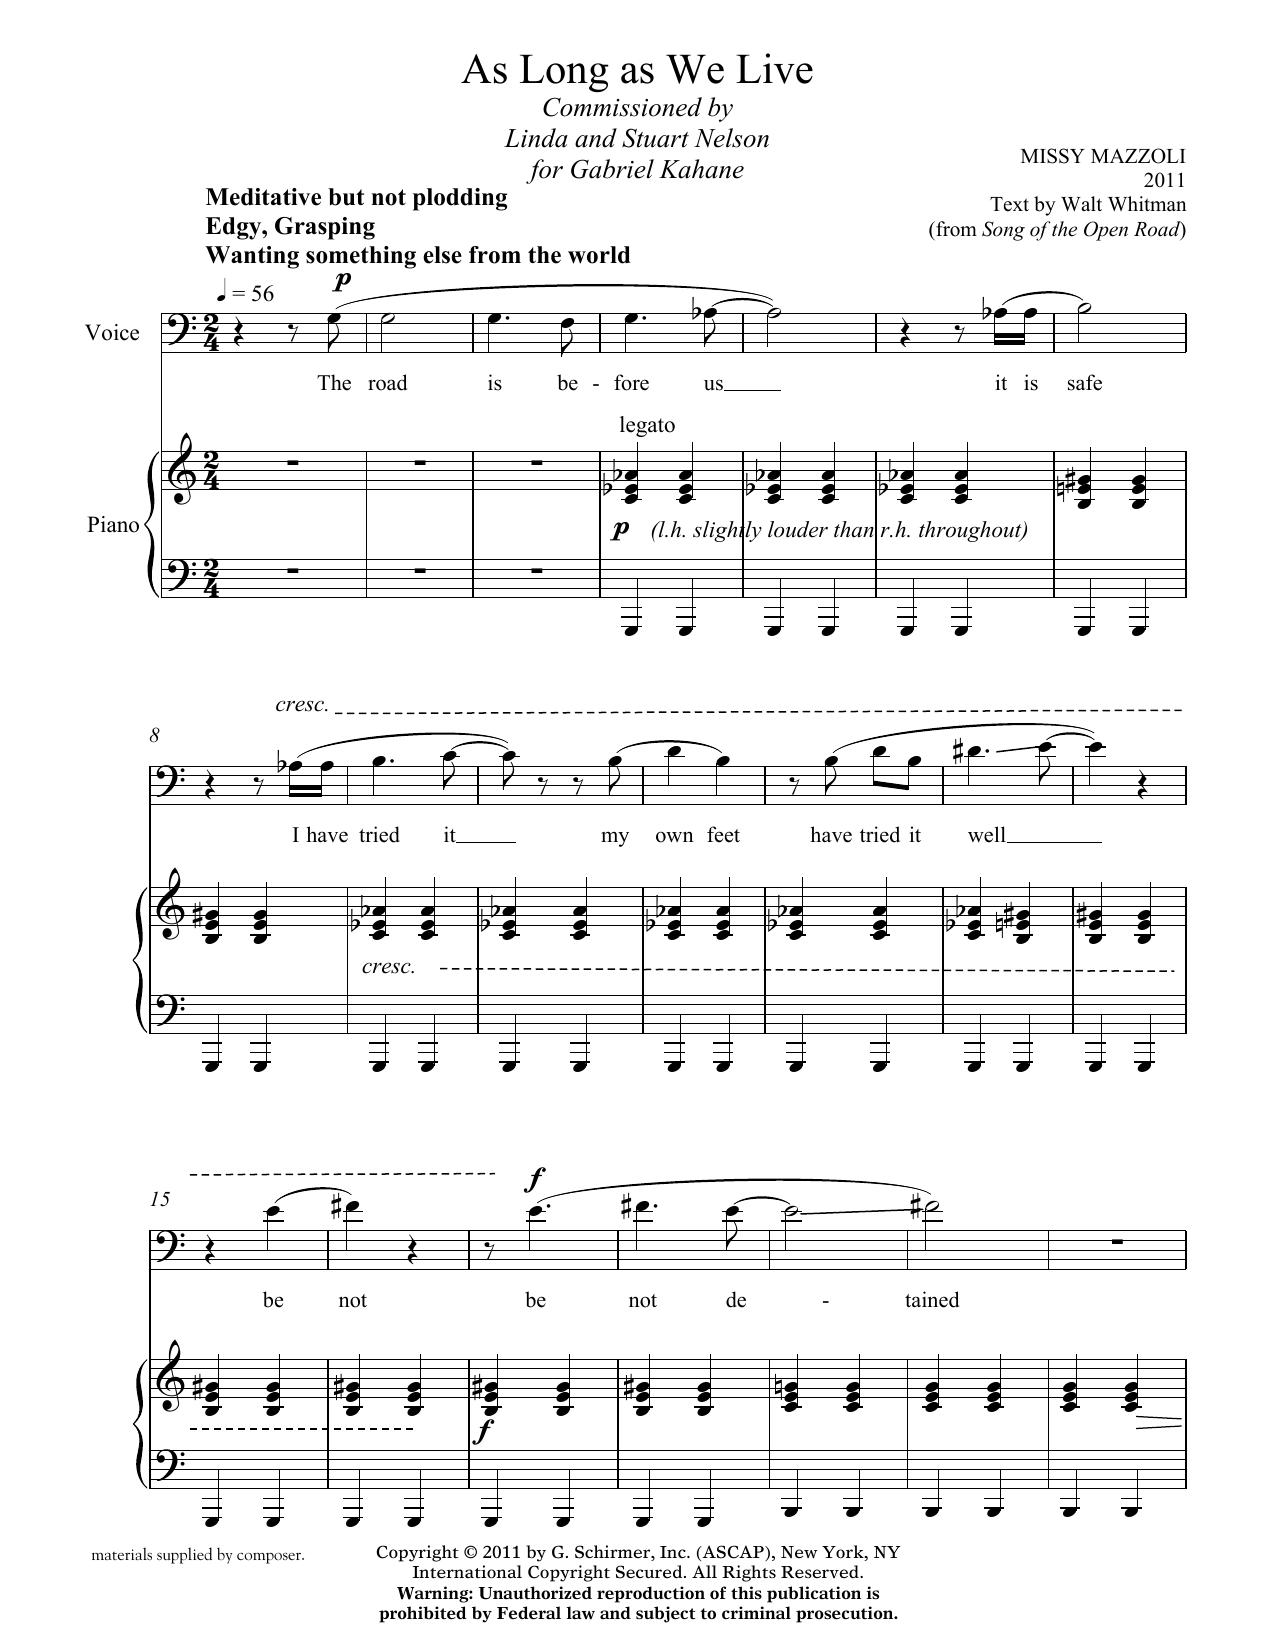 Missy Mazzoli: As Long As We Live (baritone and piano)